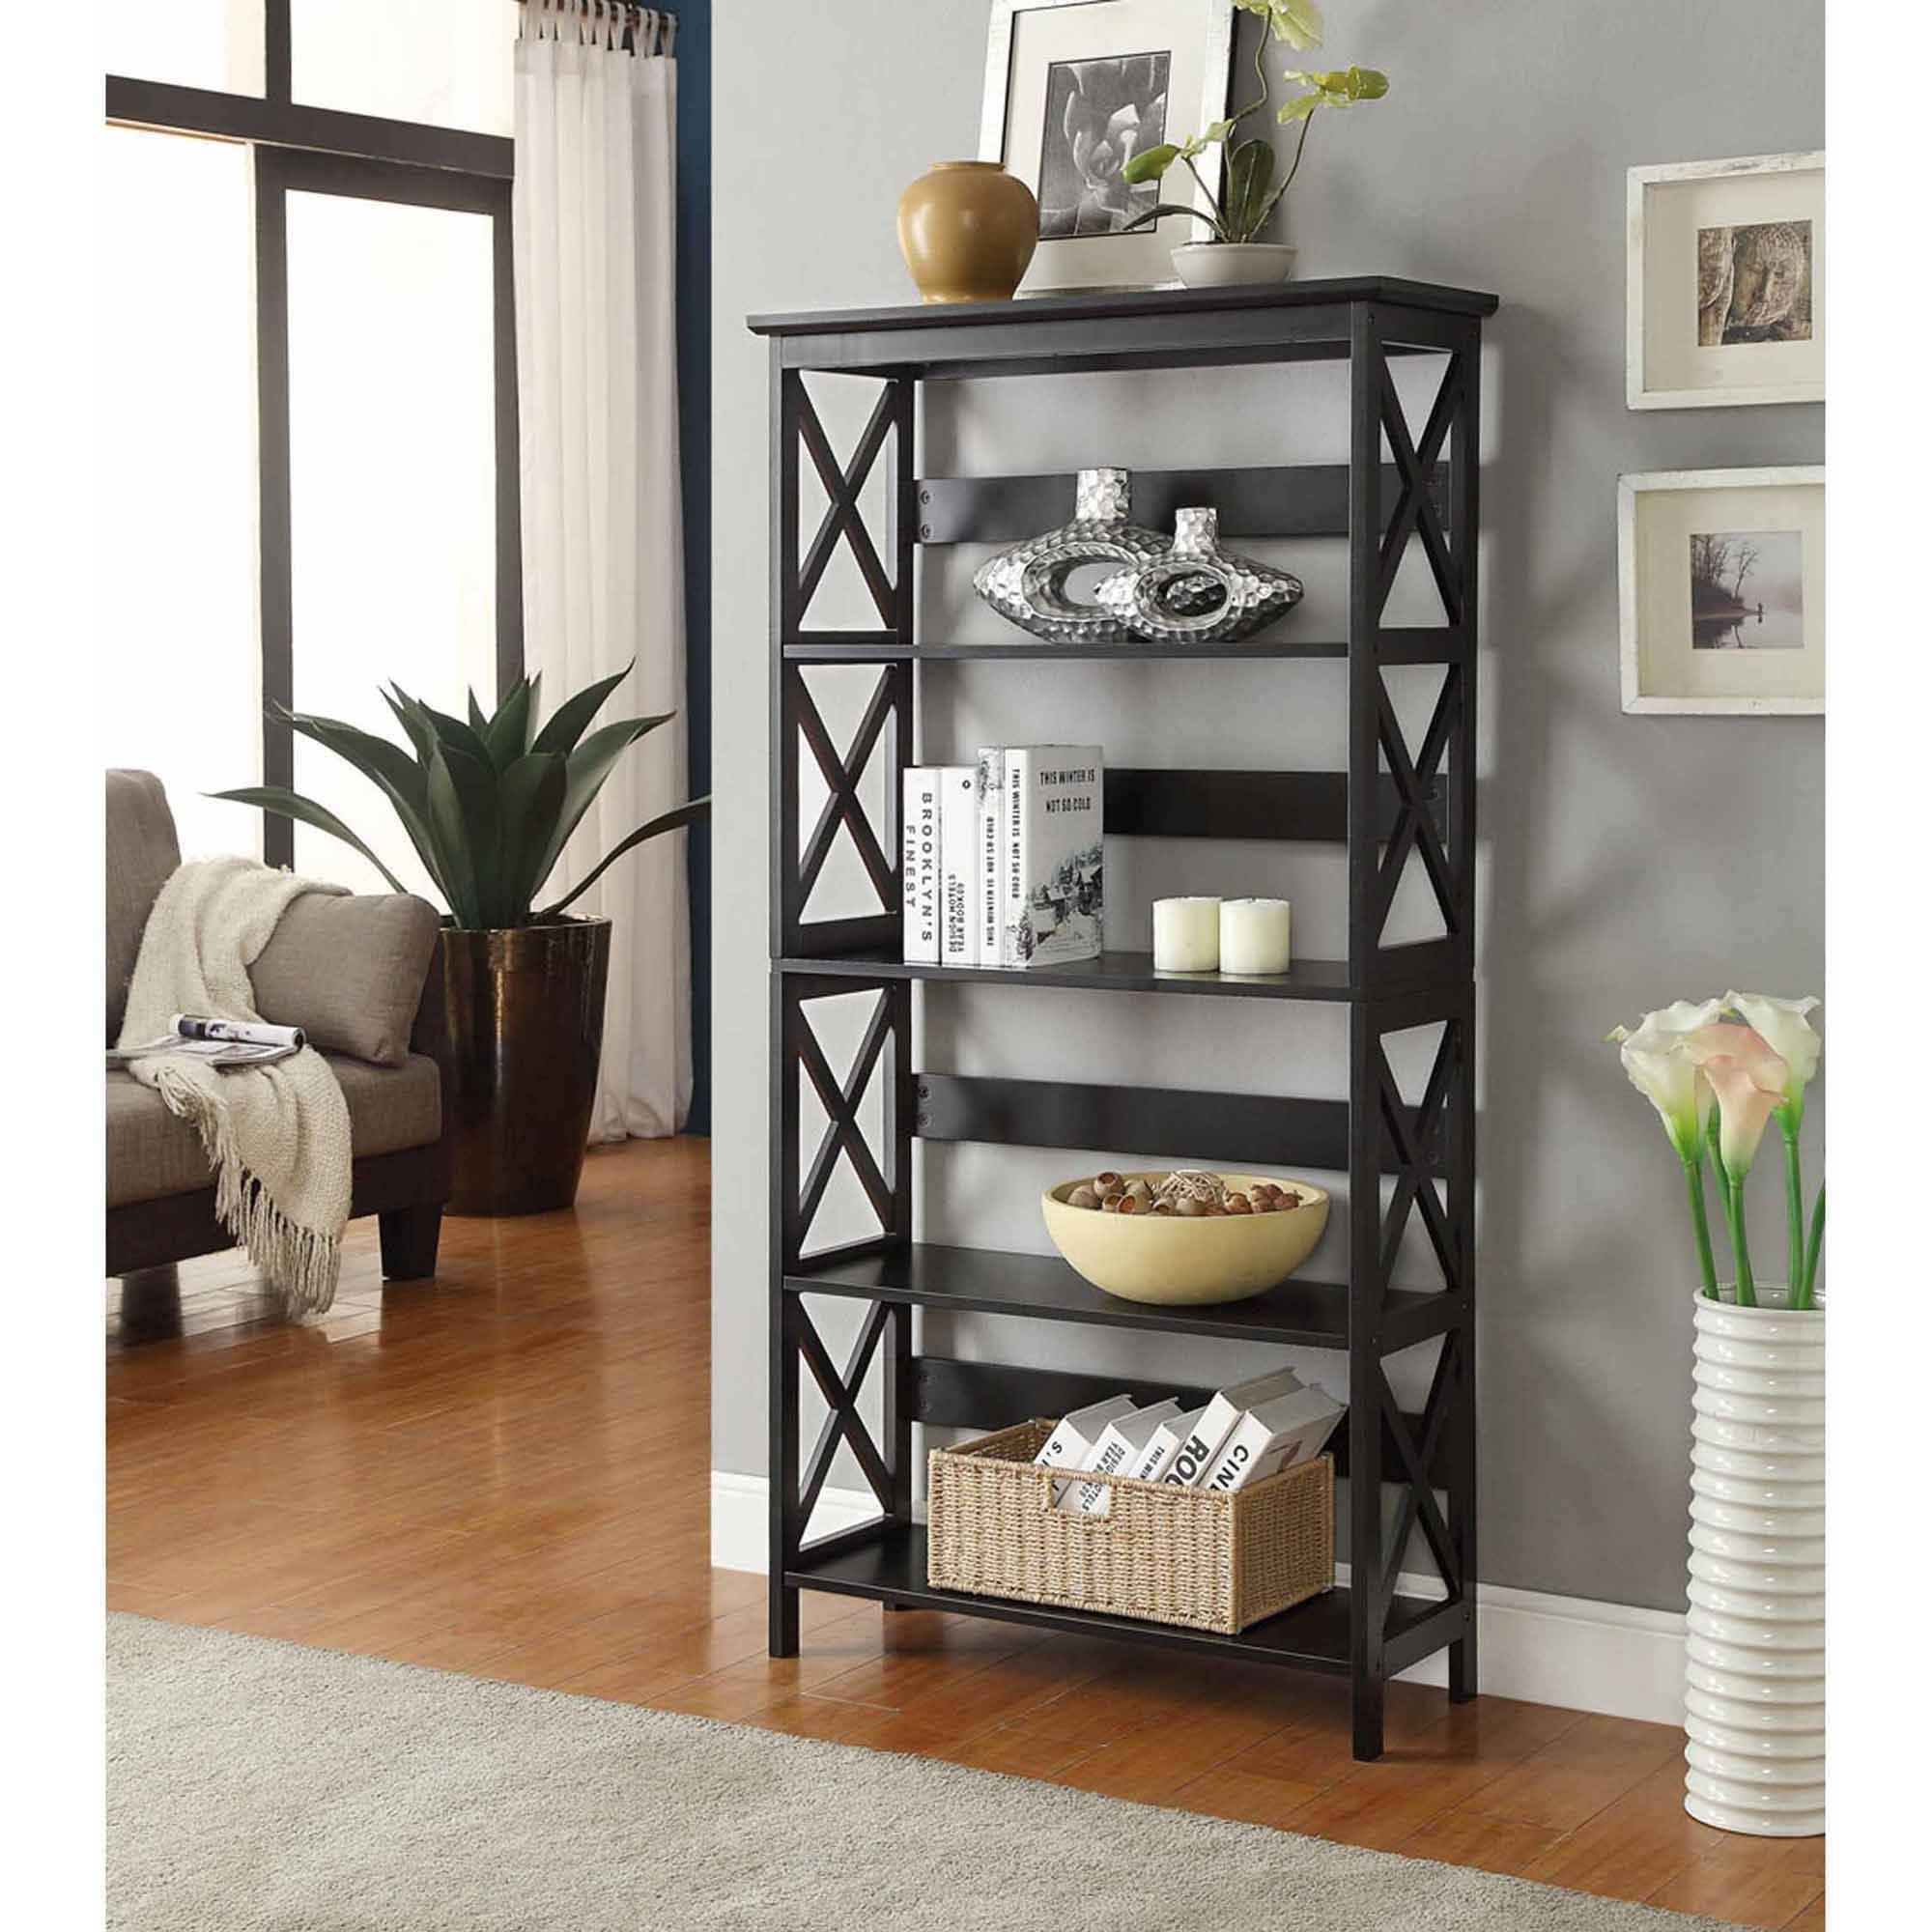 Convenience Concepts Oxford 5-Tier Bookcase, Multiple Colors